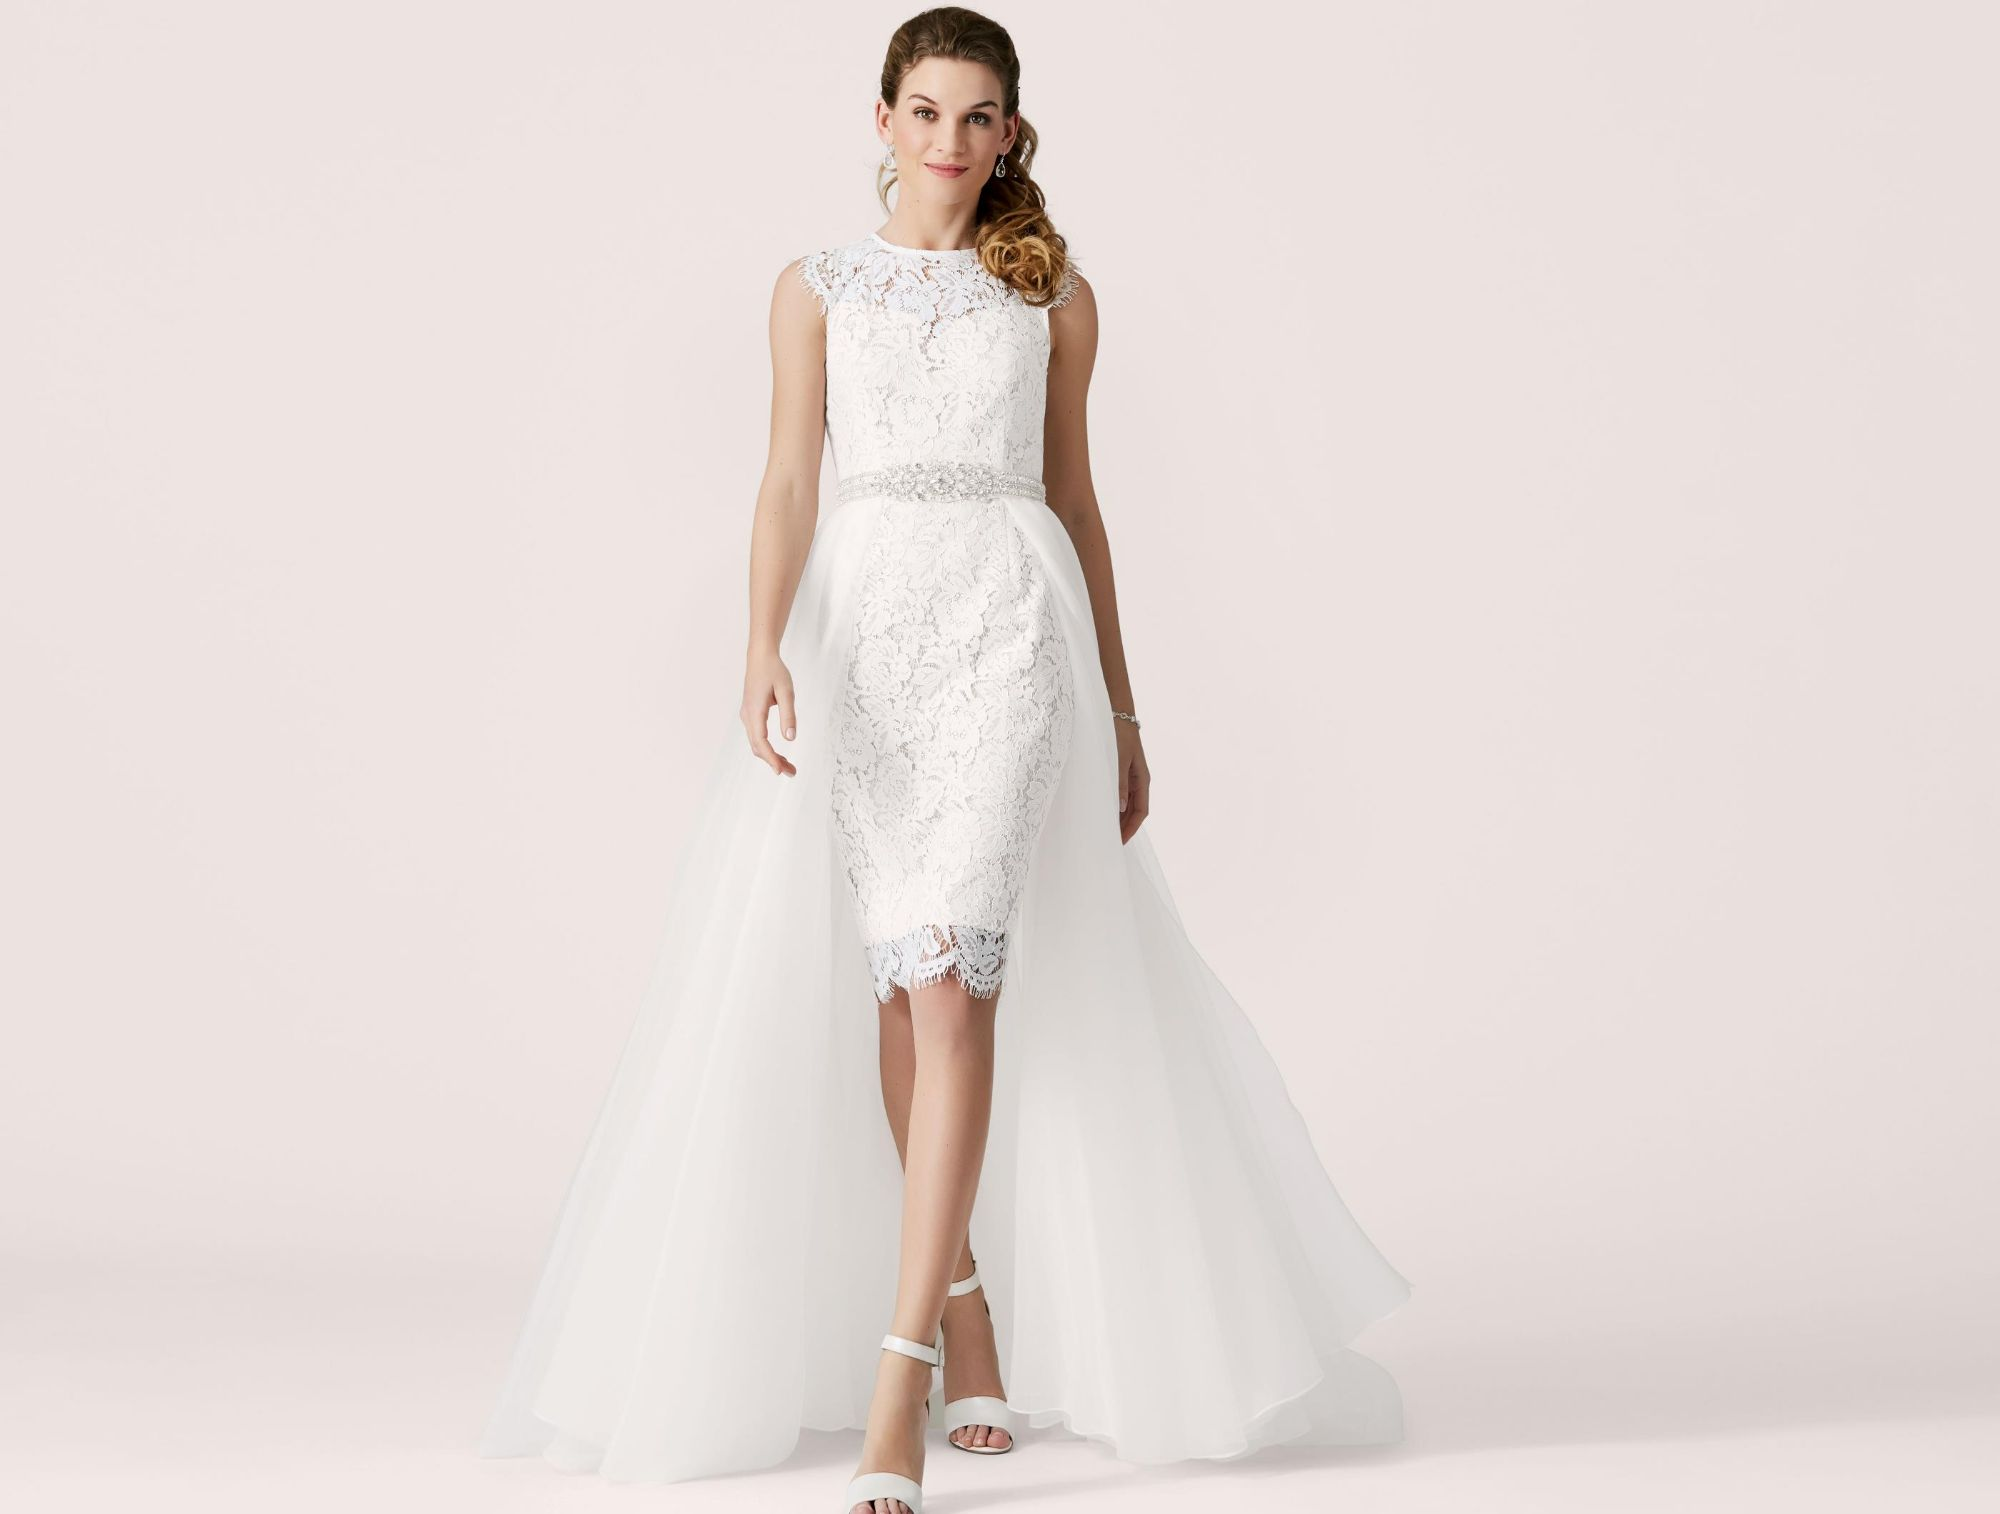 Alternative Bridal Ideas With Modern Accessories